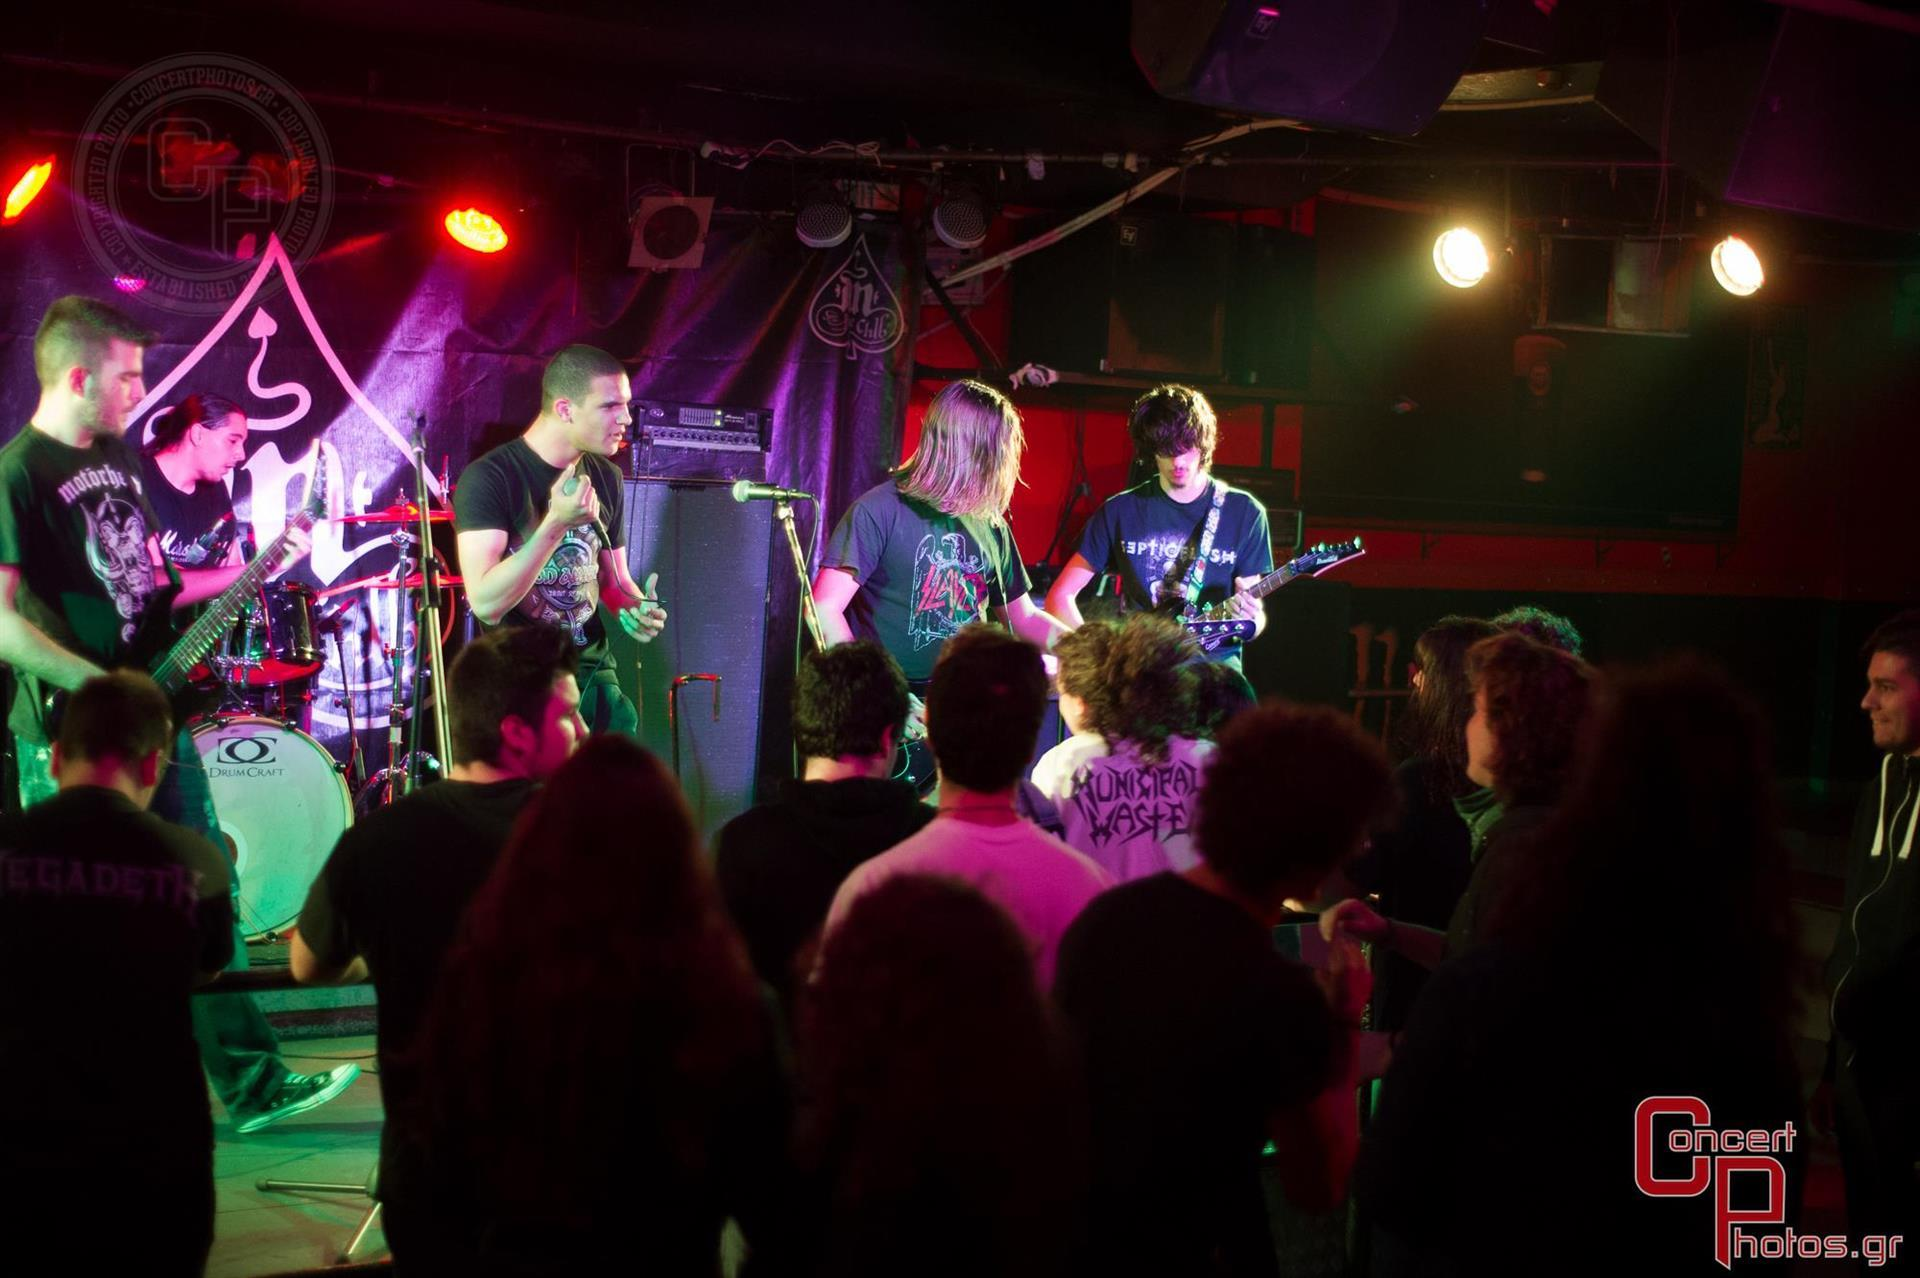 Battle Of The Bands Athens - Leg 3- photographer:  - ConcertPhotos - 20150104_2108_30